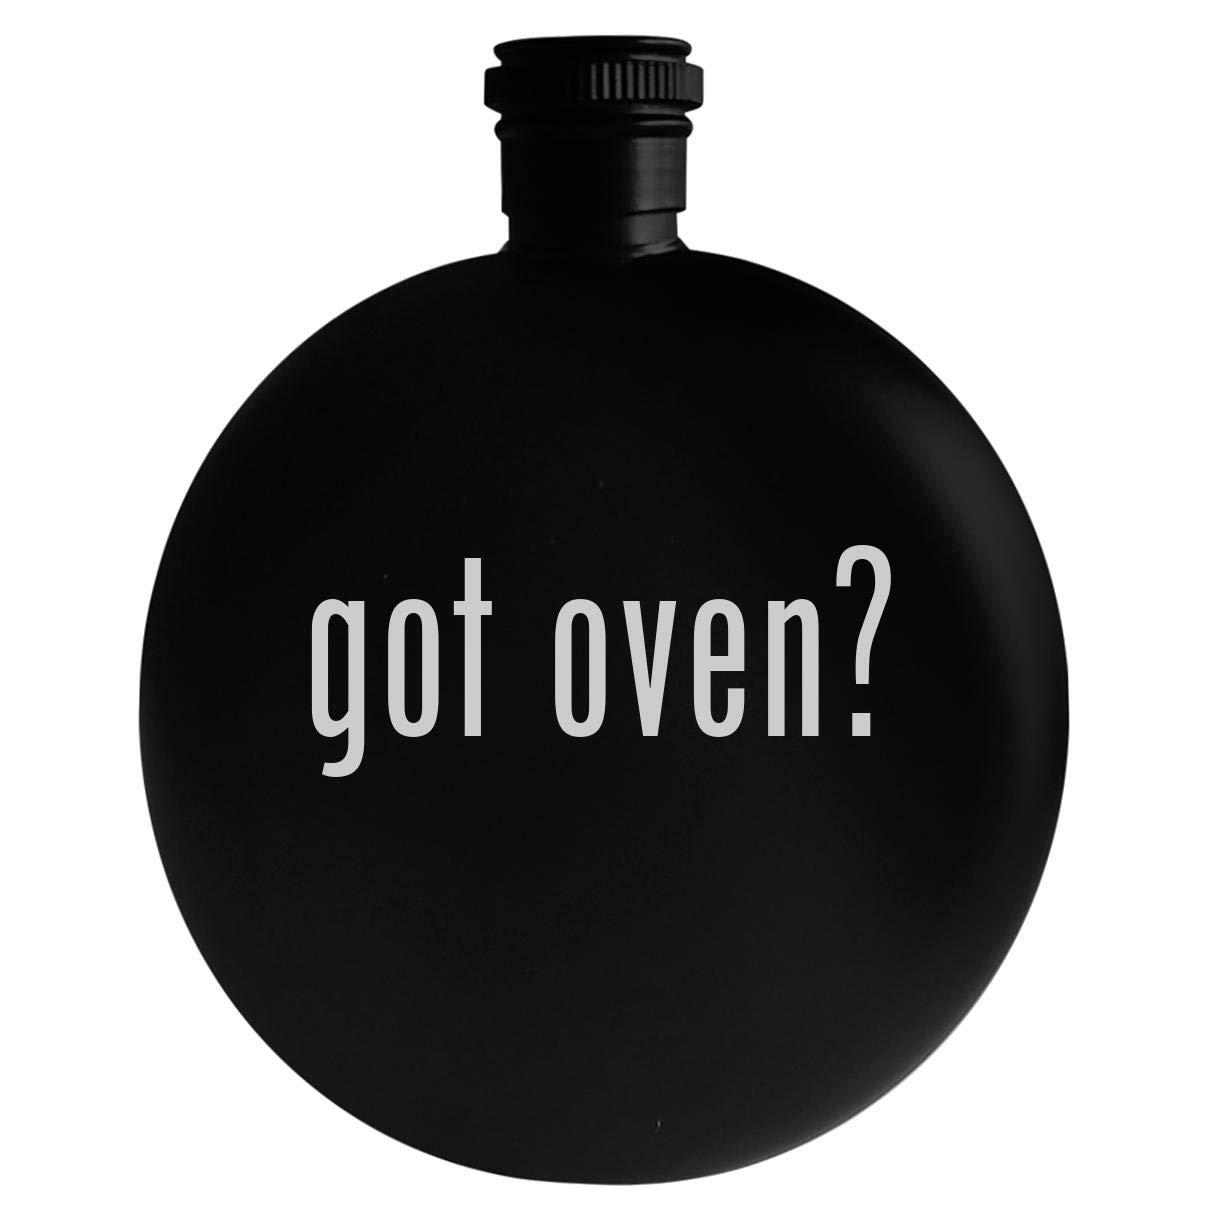 got oven? - 5oz Round Alcohol Drinking Flask, Black